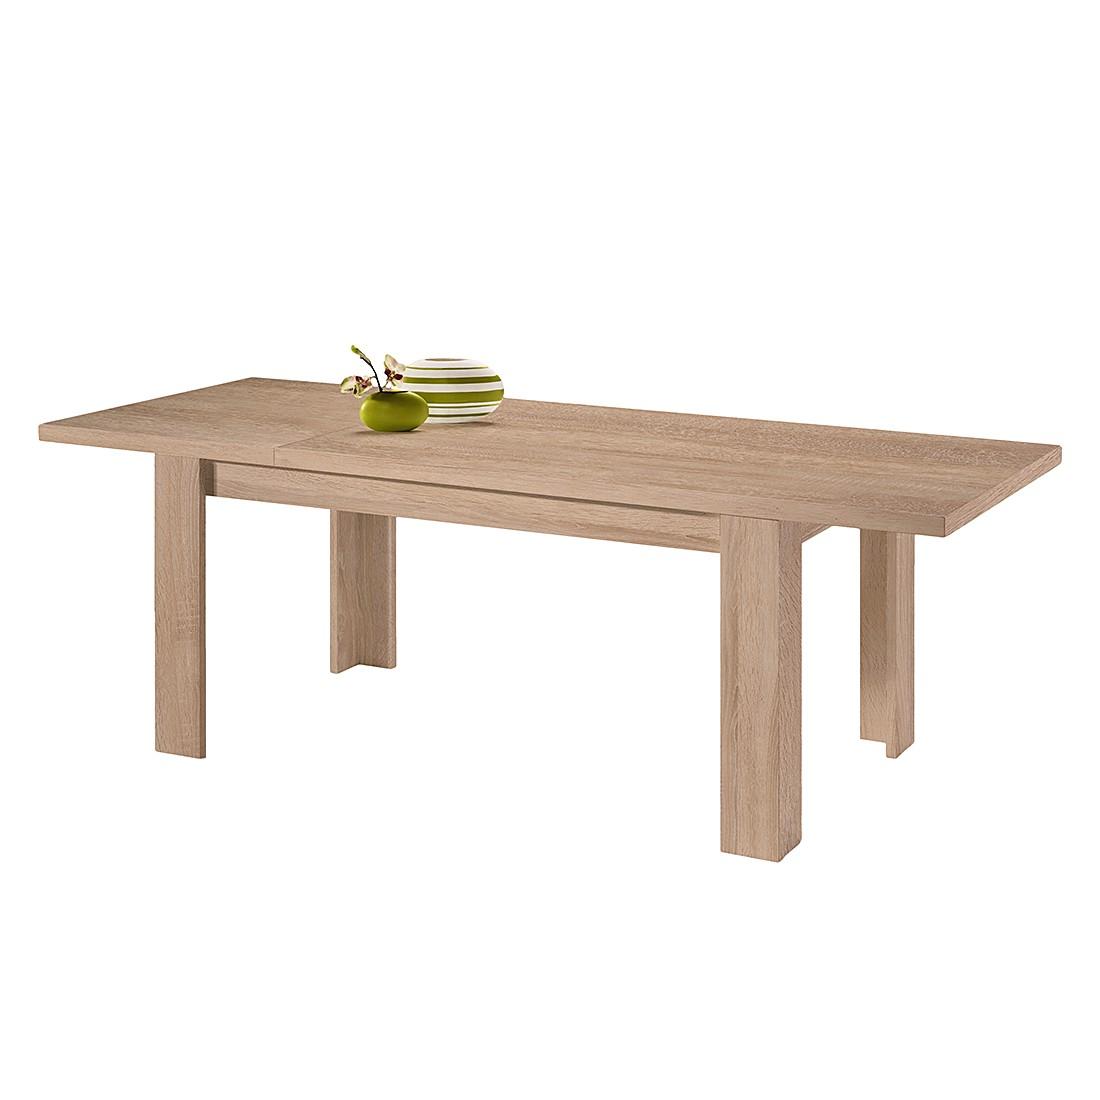 Table à manger Leaf II (extensible) - Imitation chêne brut de sciage - 160 x 90 cm, mooved